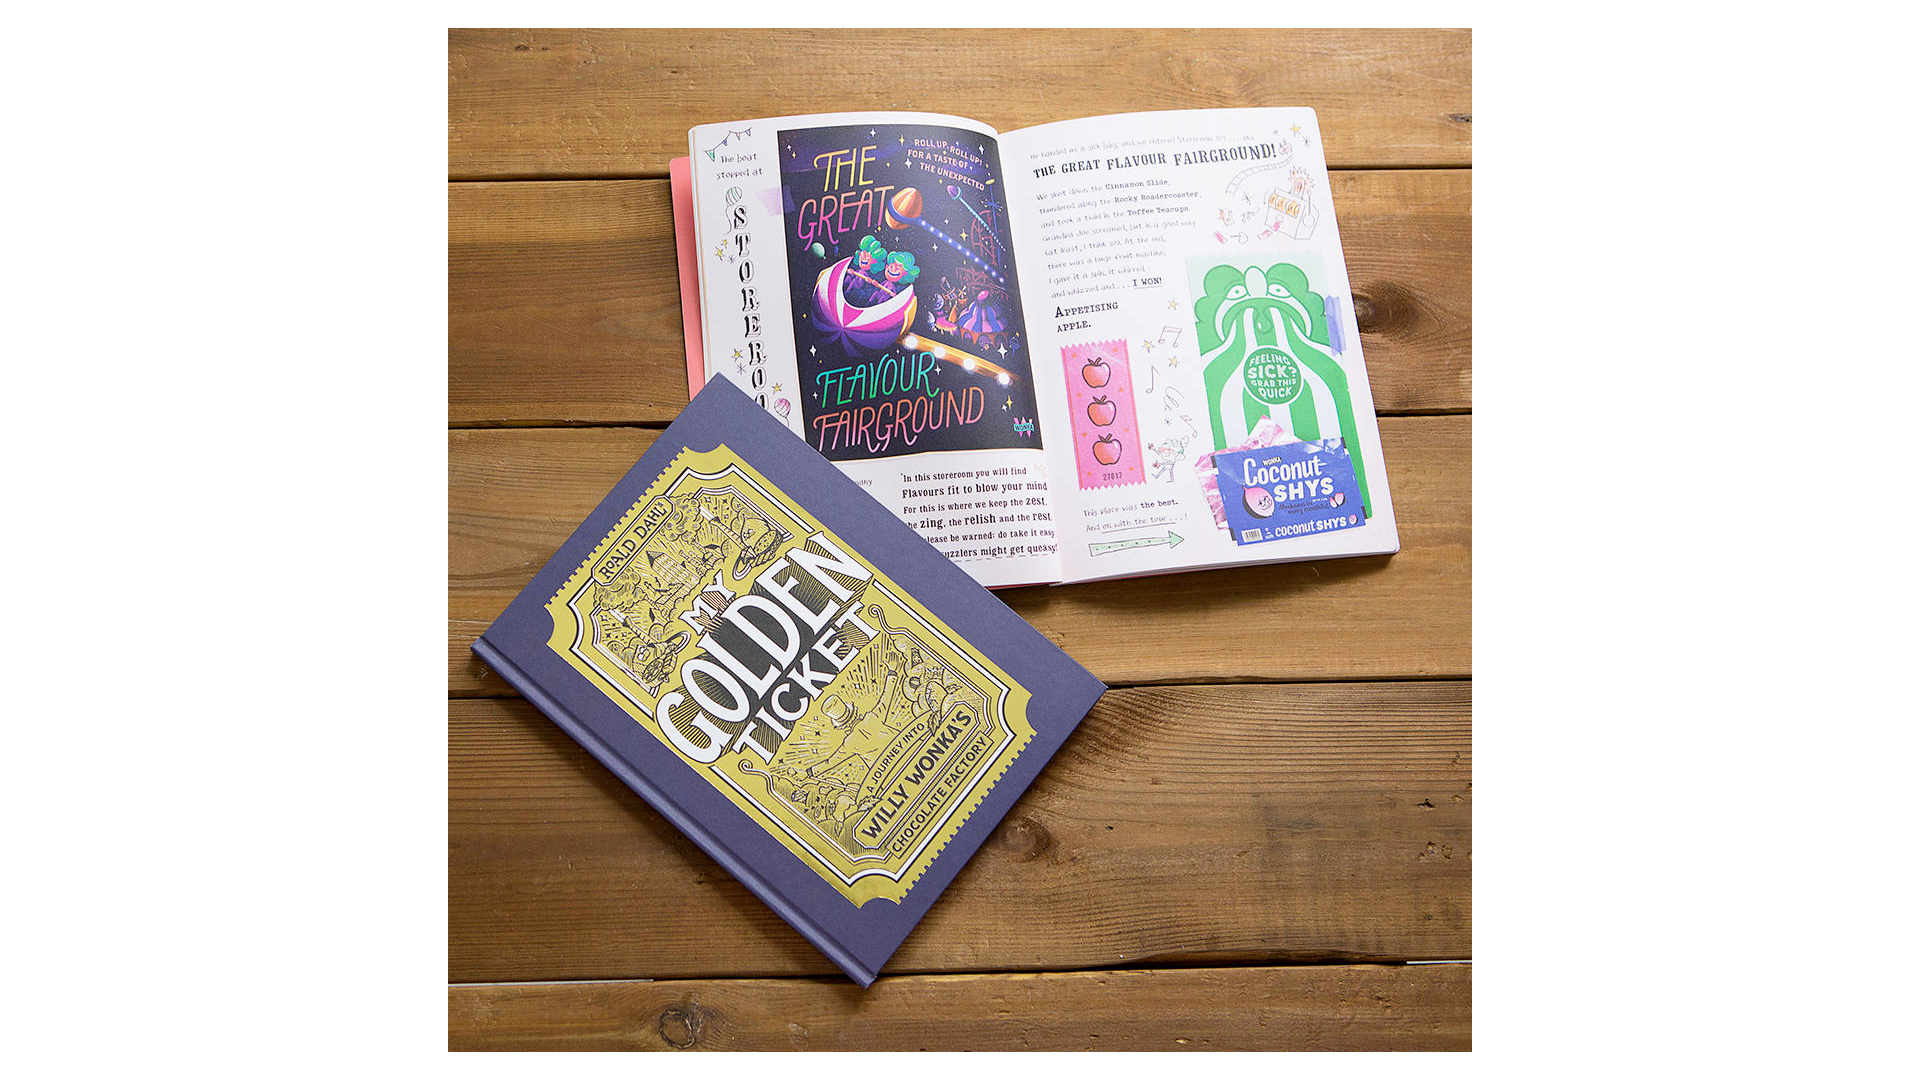 Livre d'histoires de Willy Wonka